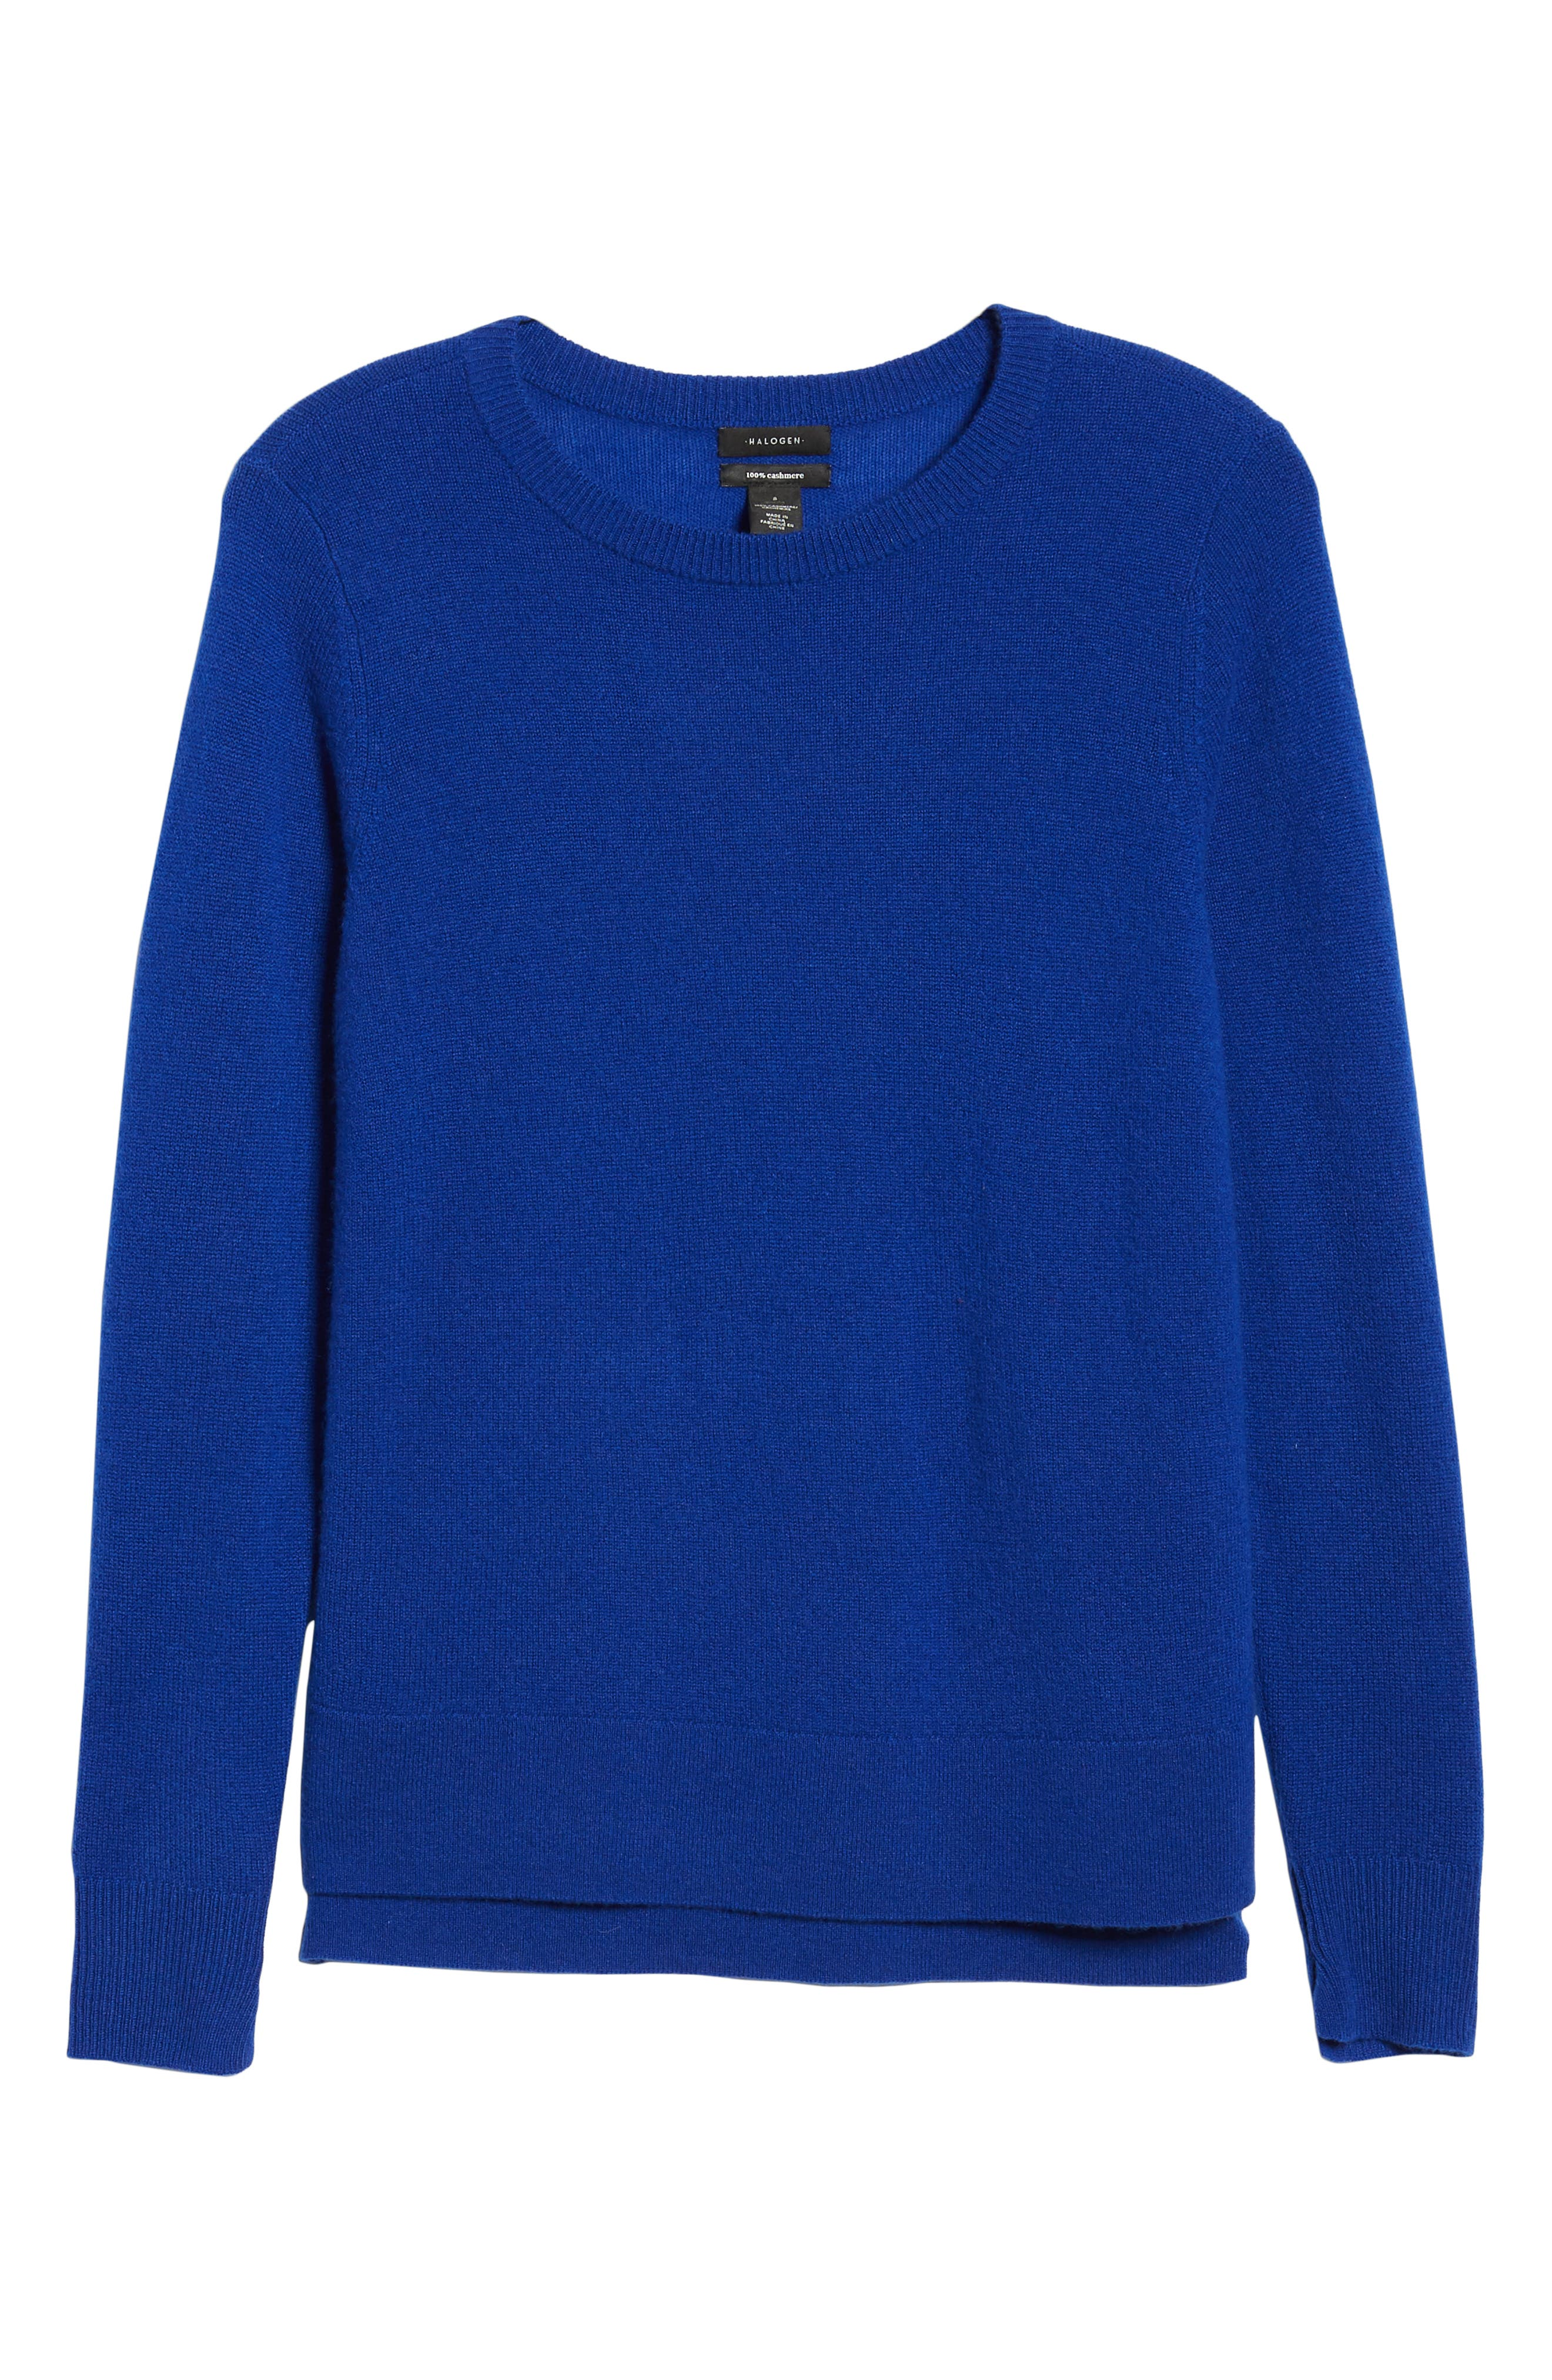 Crewneck Cashmere Sweater,                             Alternate thumbnail 6, color,                             BLUE MAZARINE